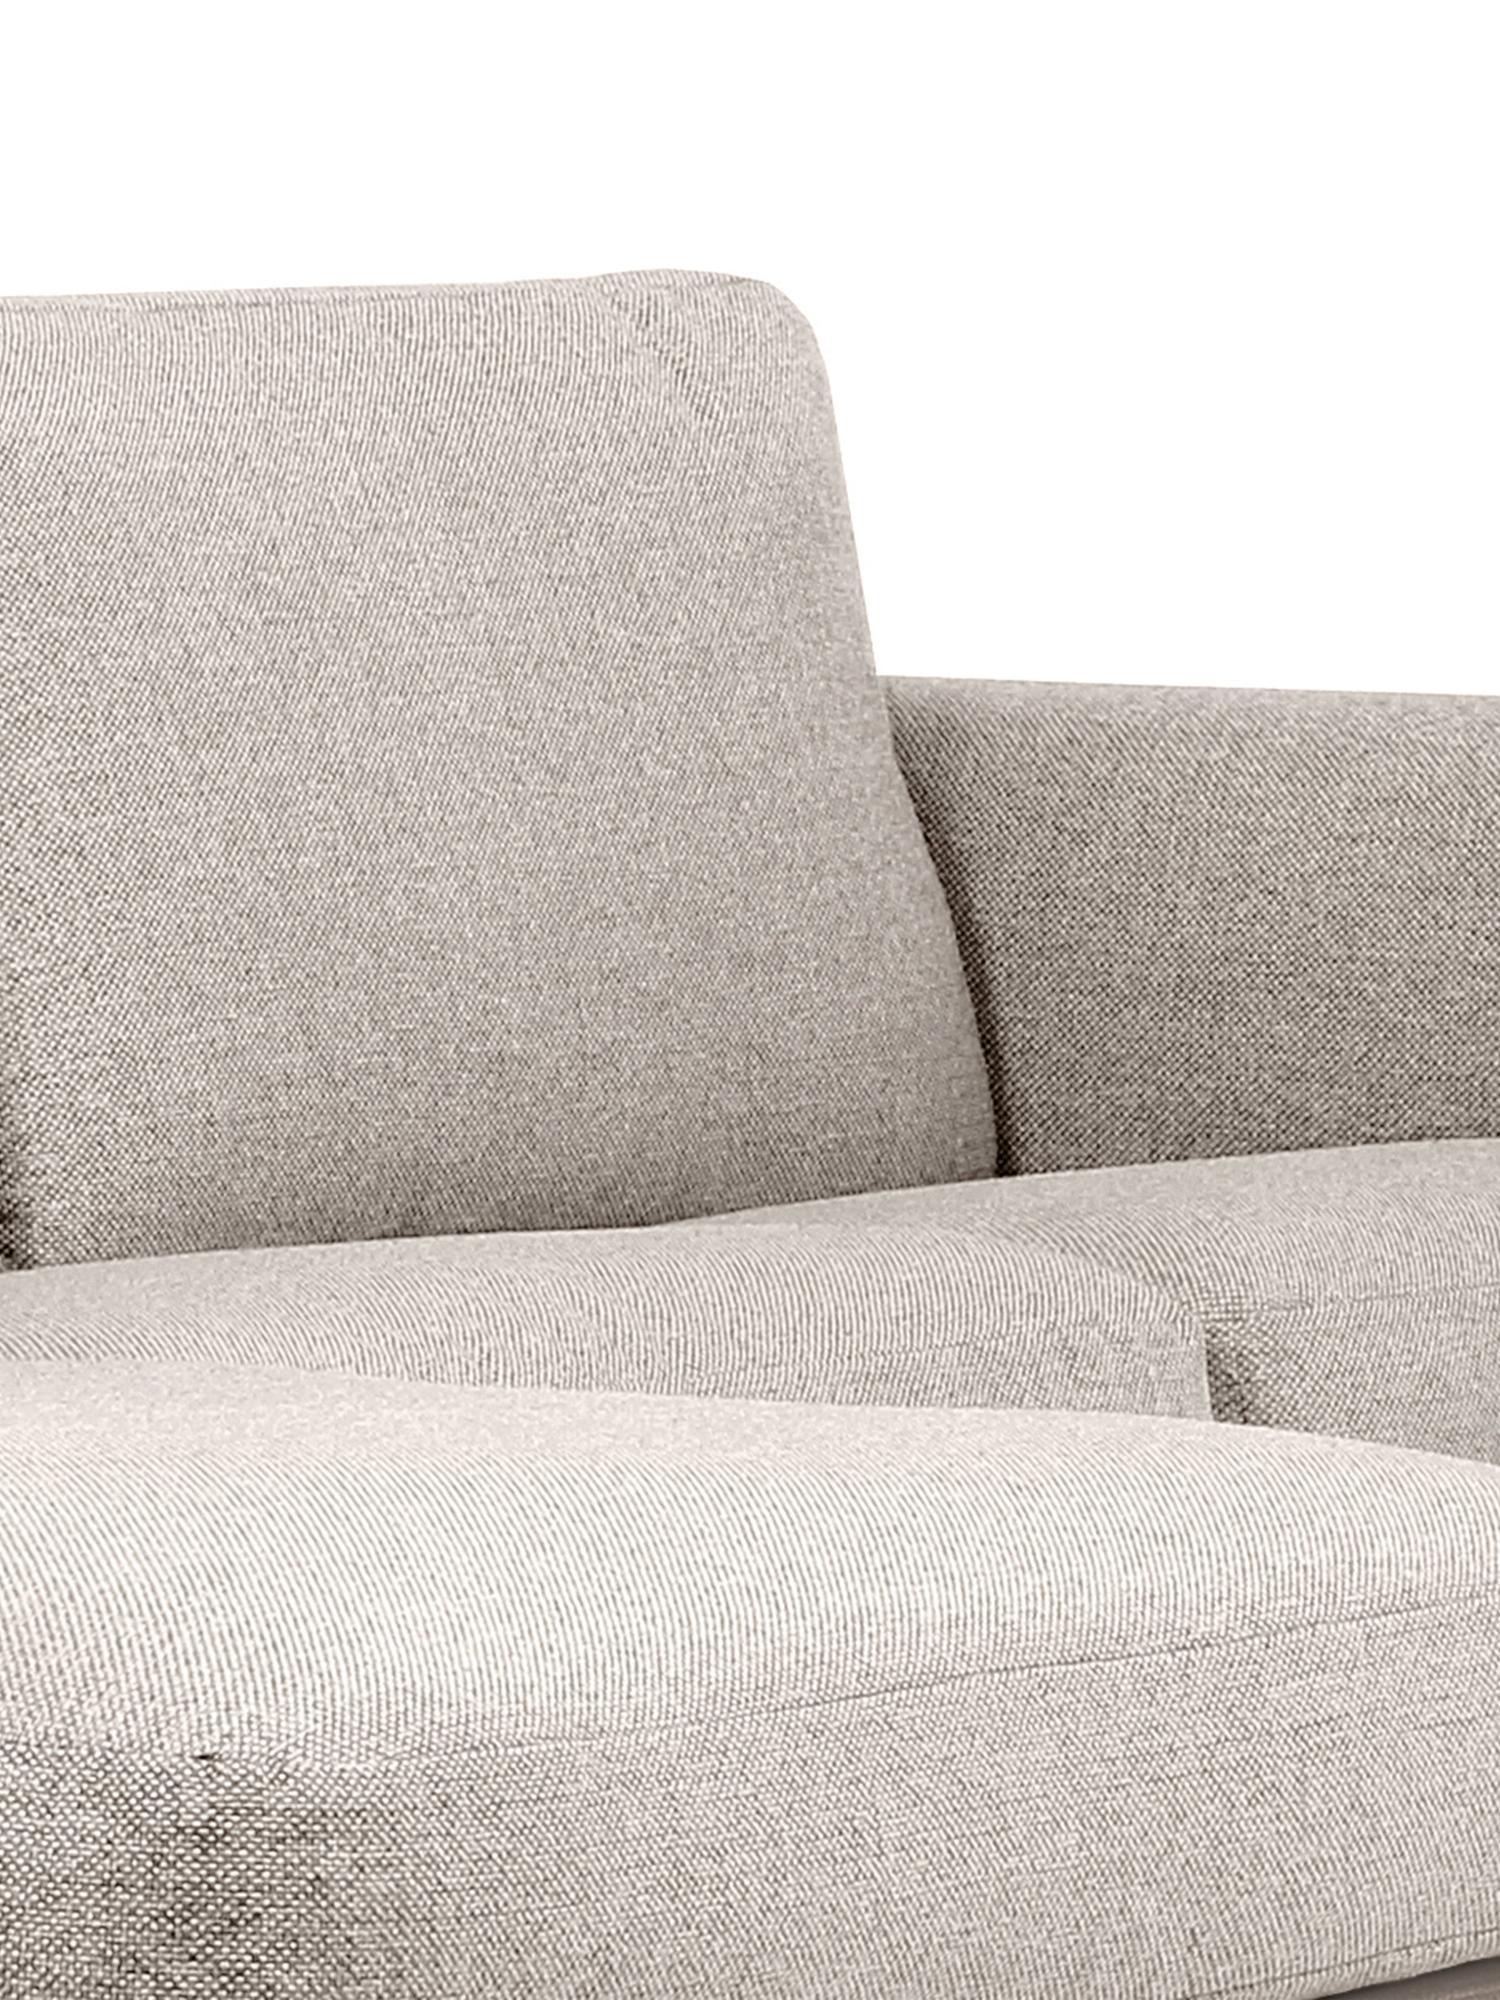 Ecksofa Cucita (3-Sitzer), Bezug: Webstoff (Polyester) Der , Gestell: Massives Kiefernholz, Webstoff Beige, B 262 x T 163 cm